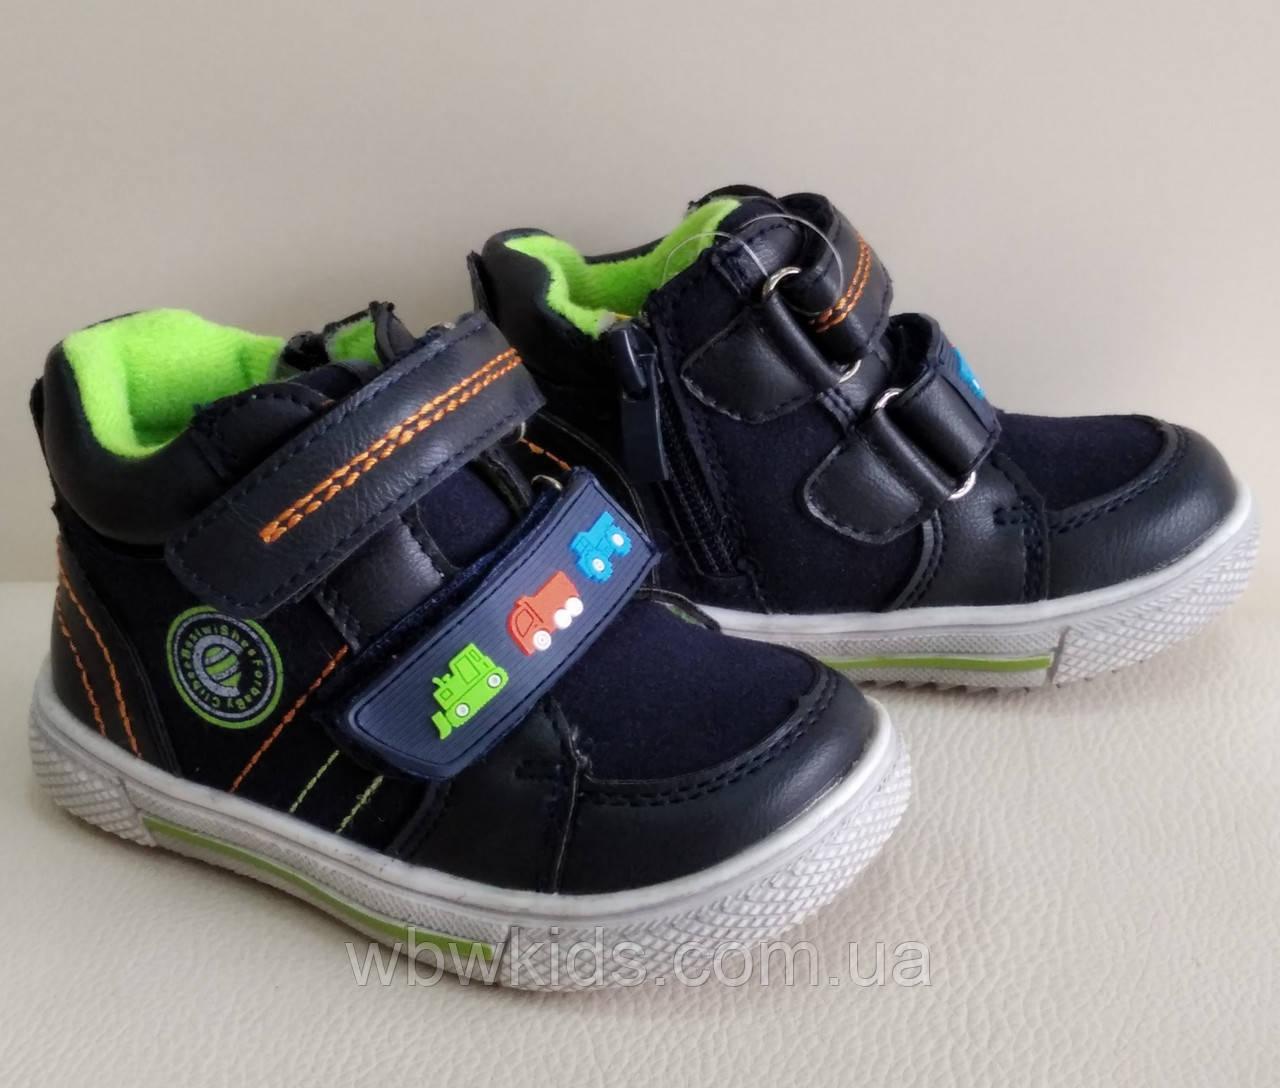 Ботинки детские Clibee F-712 для мальчика темно-синие